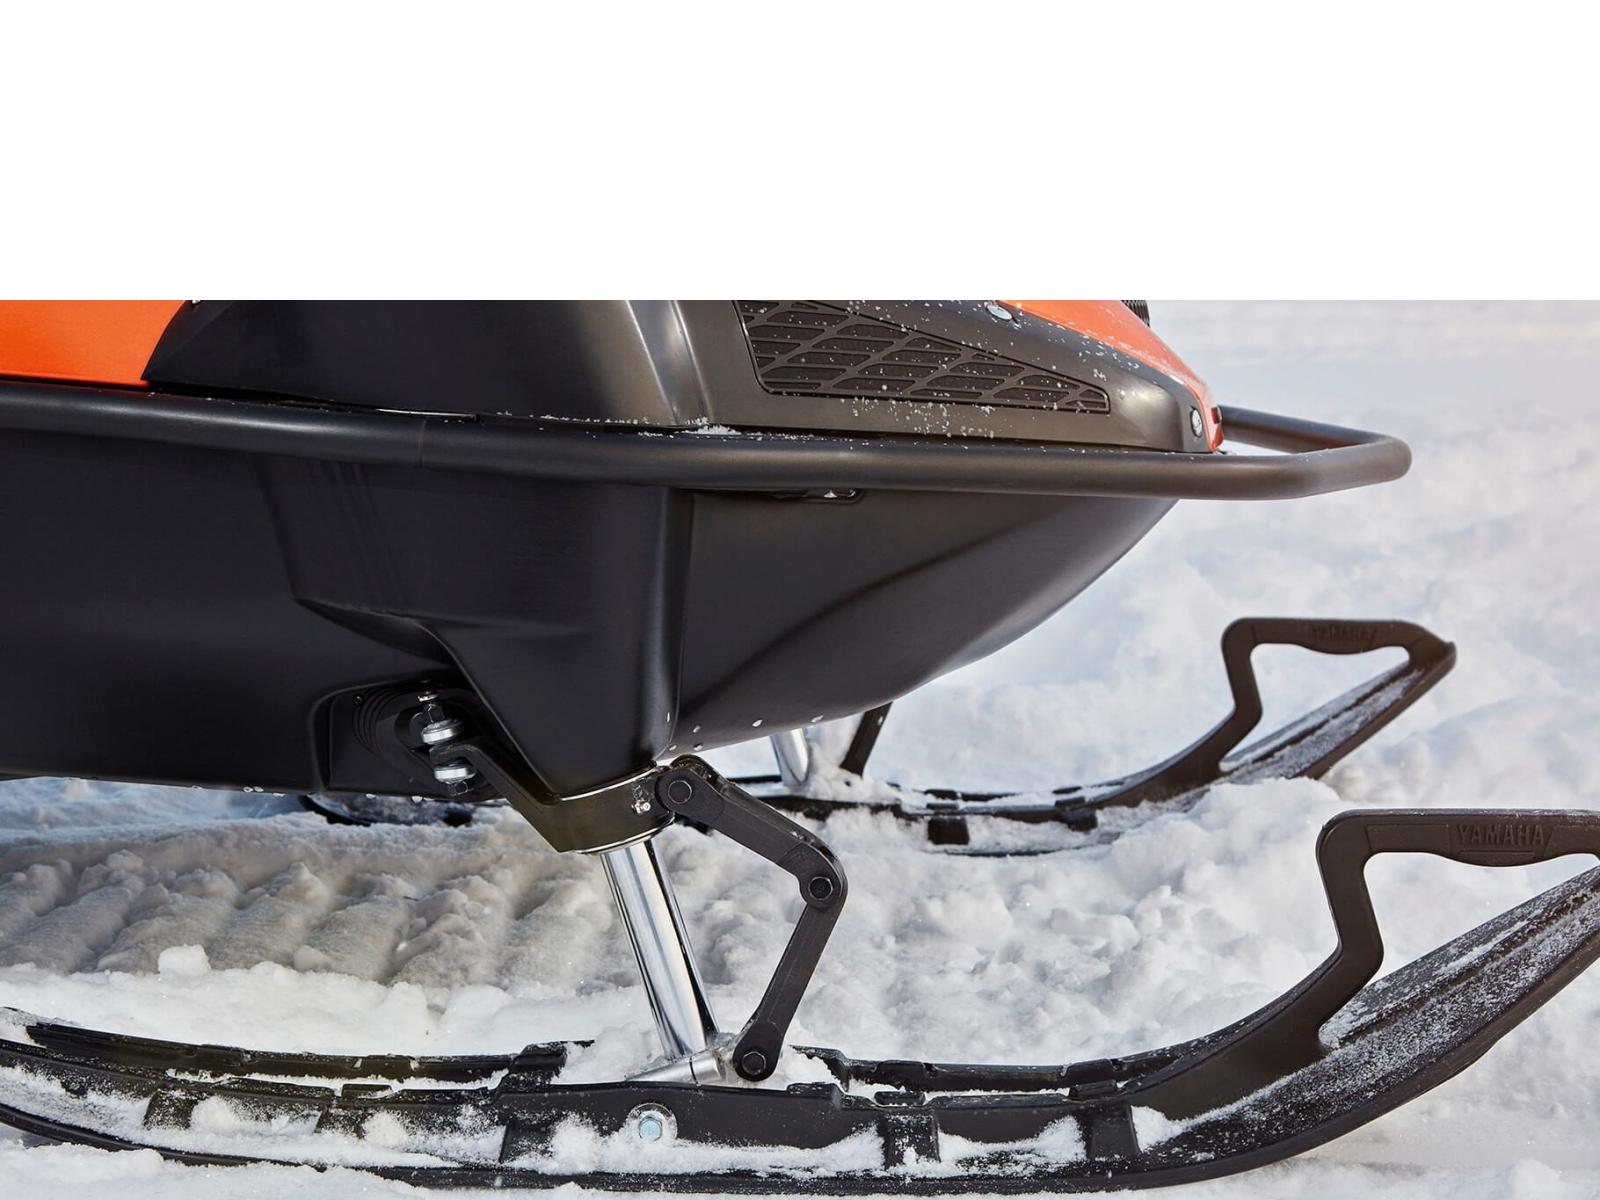 Снегоход YAMAHA VK540 V (Viking 540) - Daisy White '2020